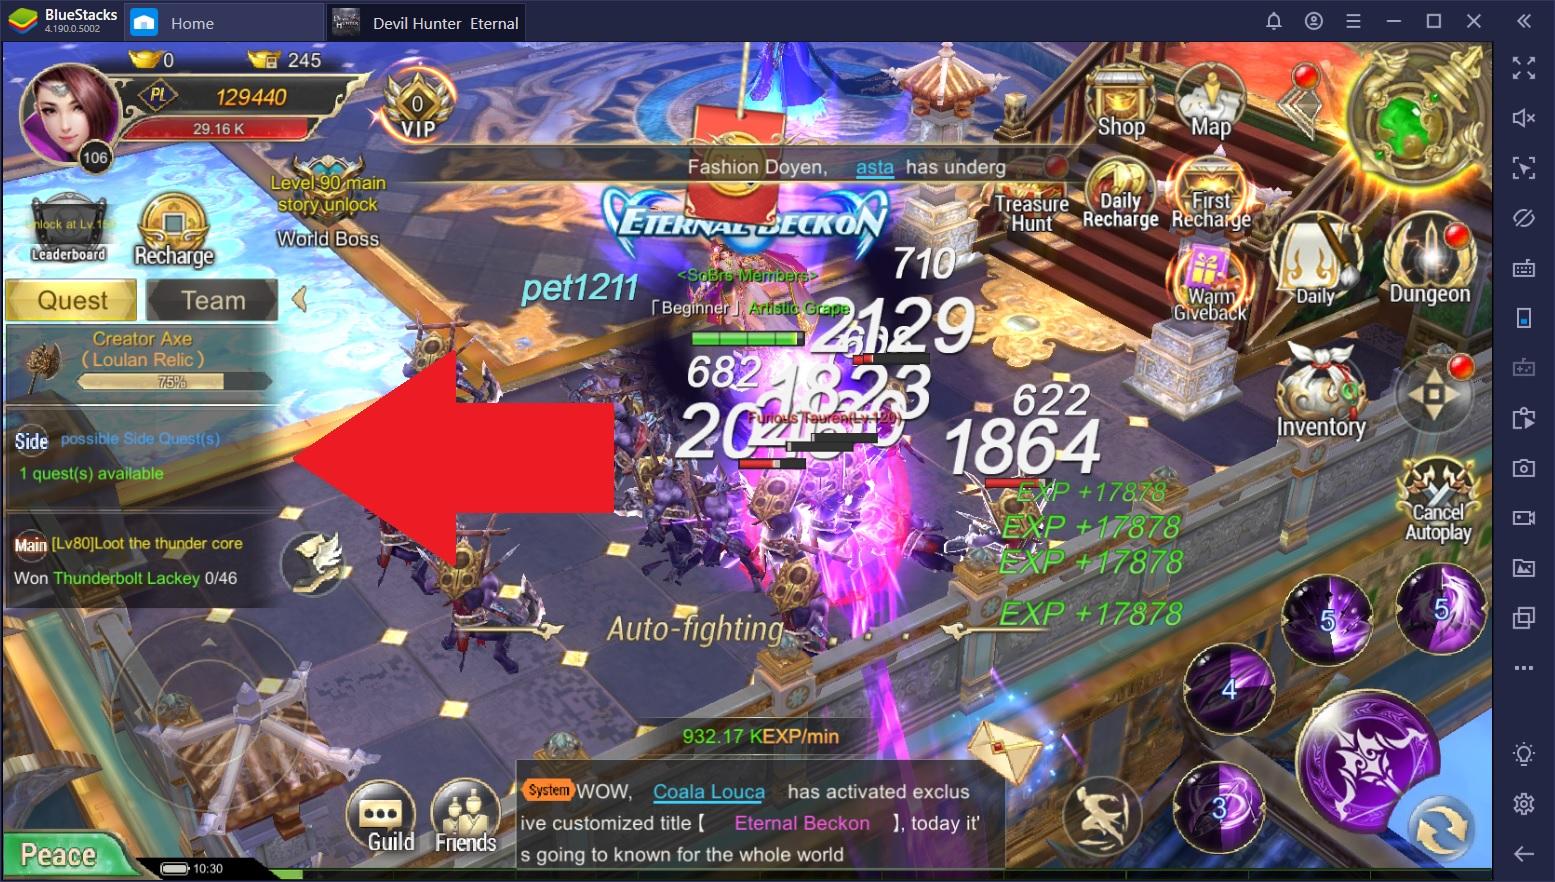 Devil Hunter: Eternal War – The Best Tips and Tricks for Getting Started on BlueStacks